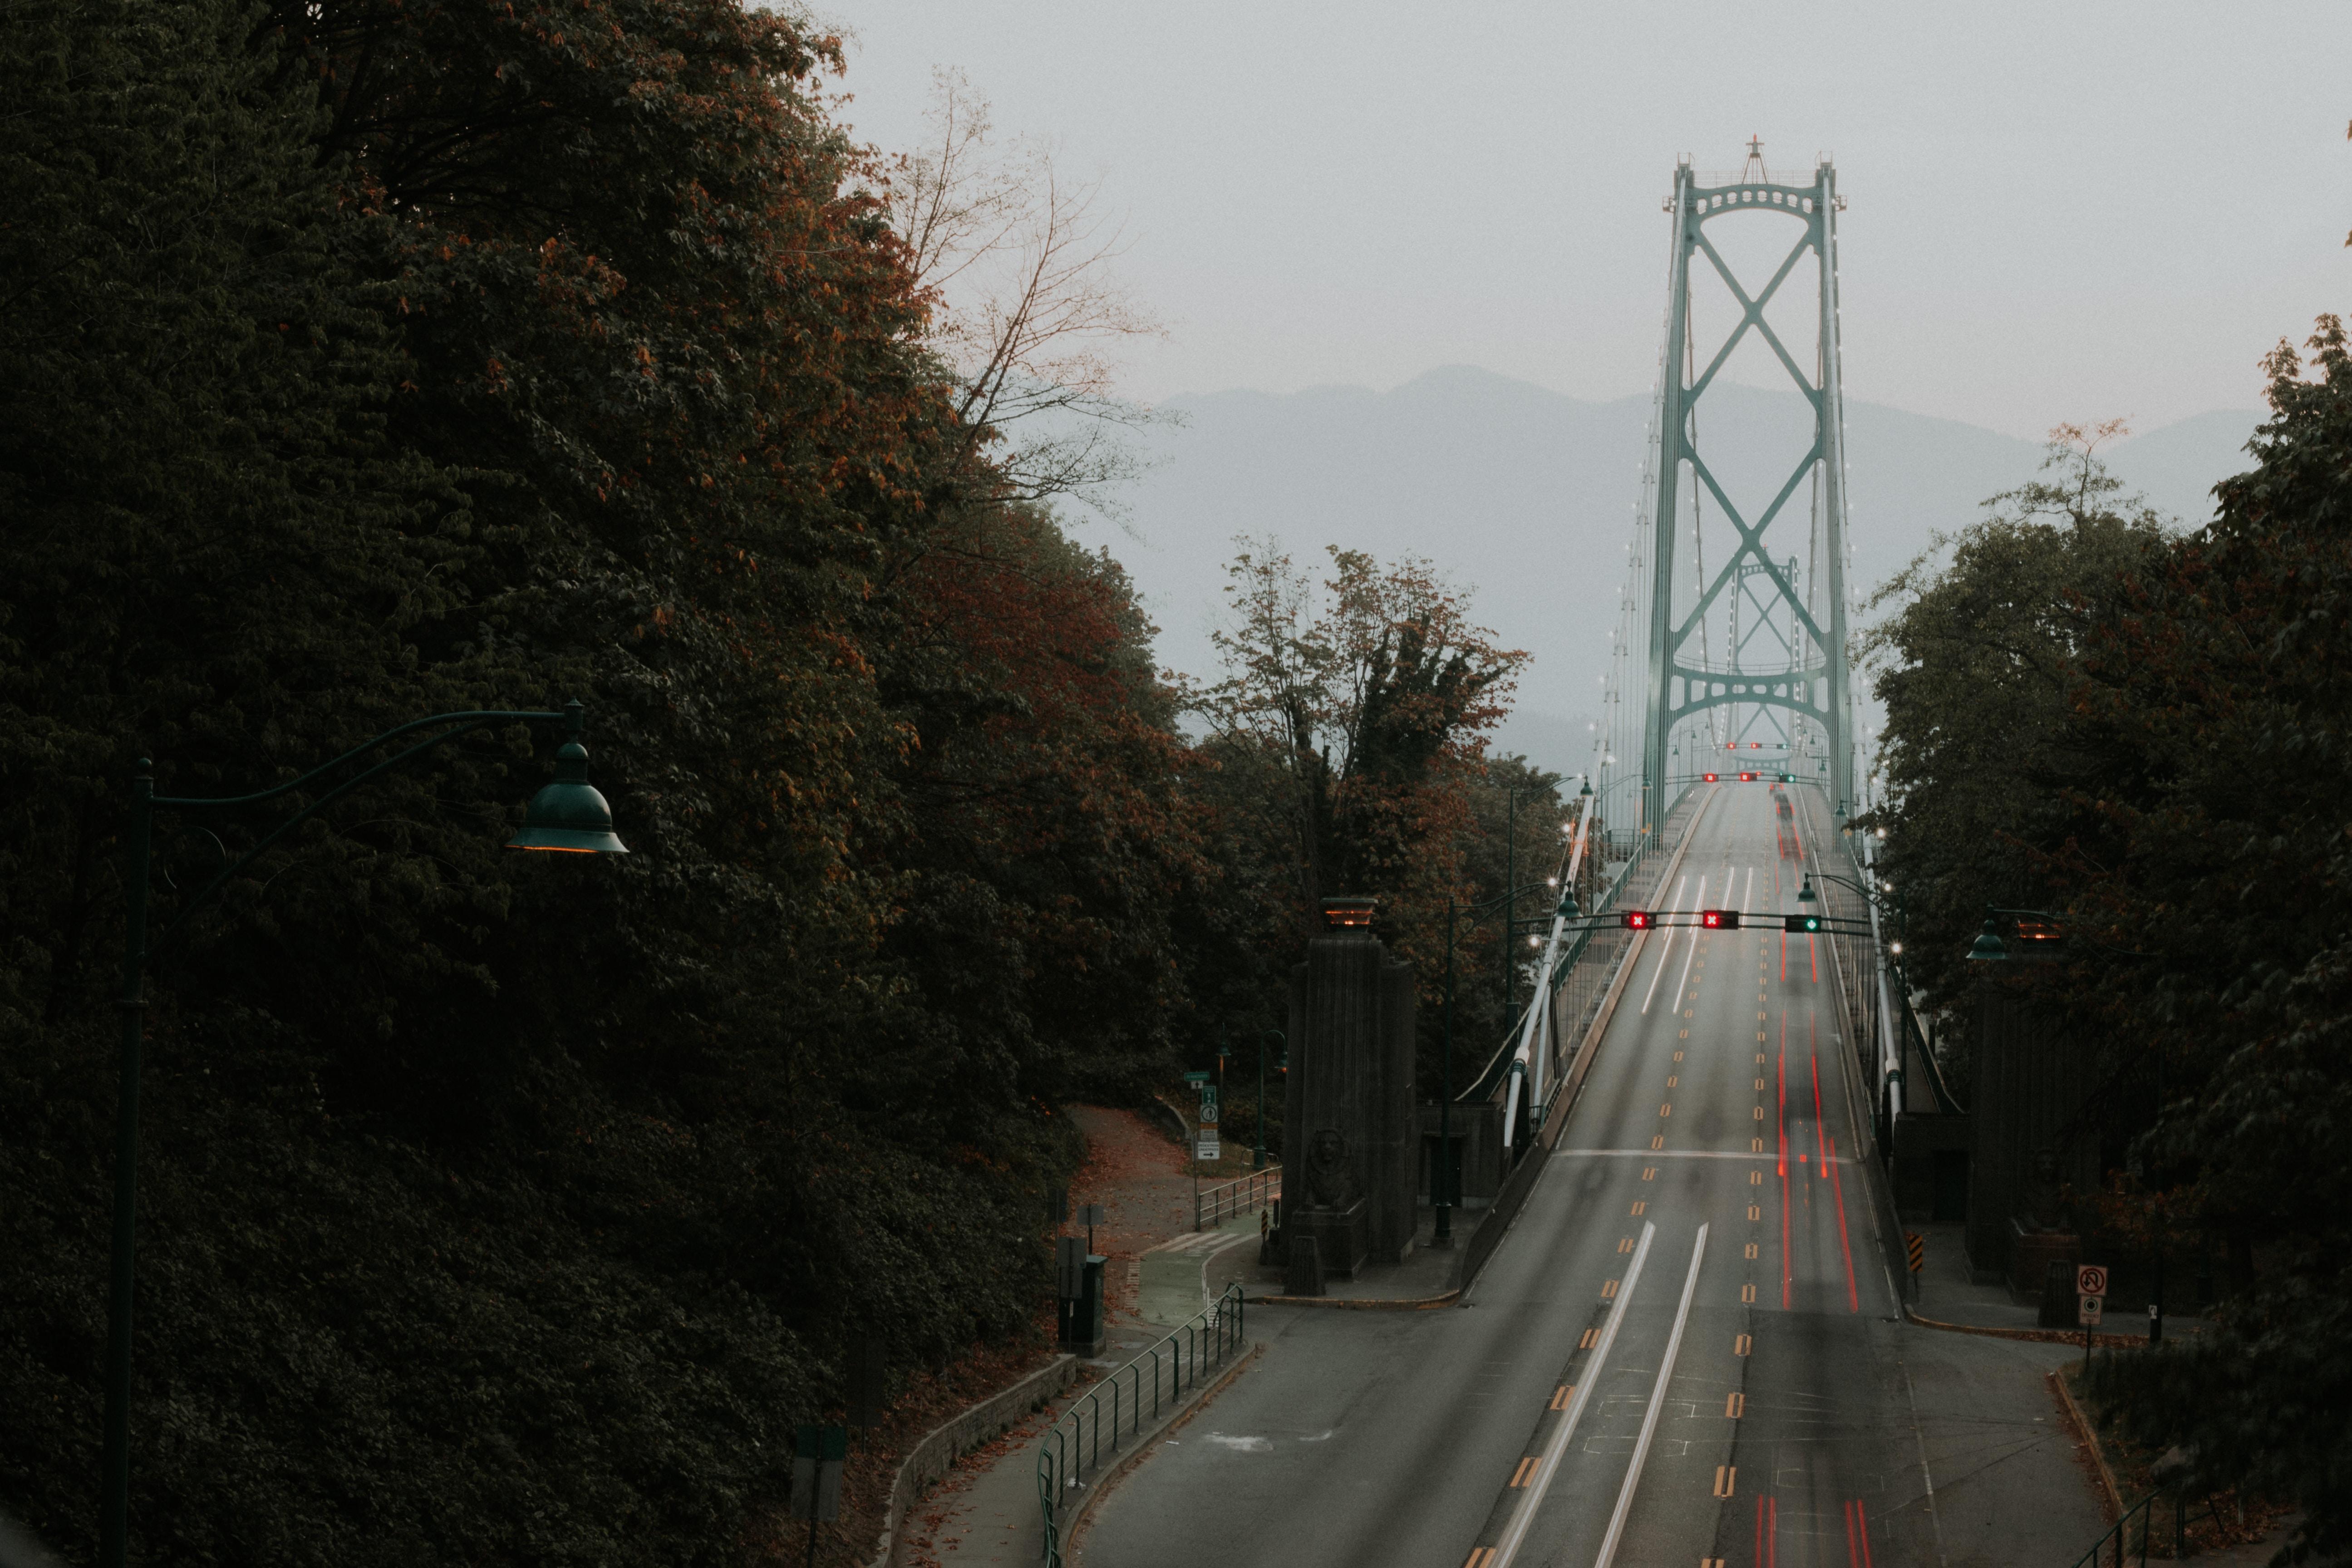 gray bridge surrounded of trees